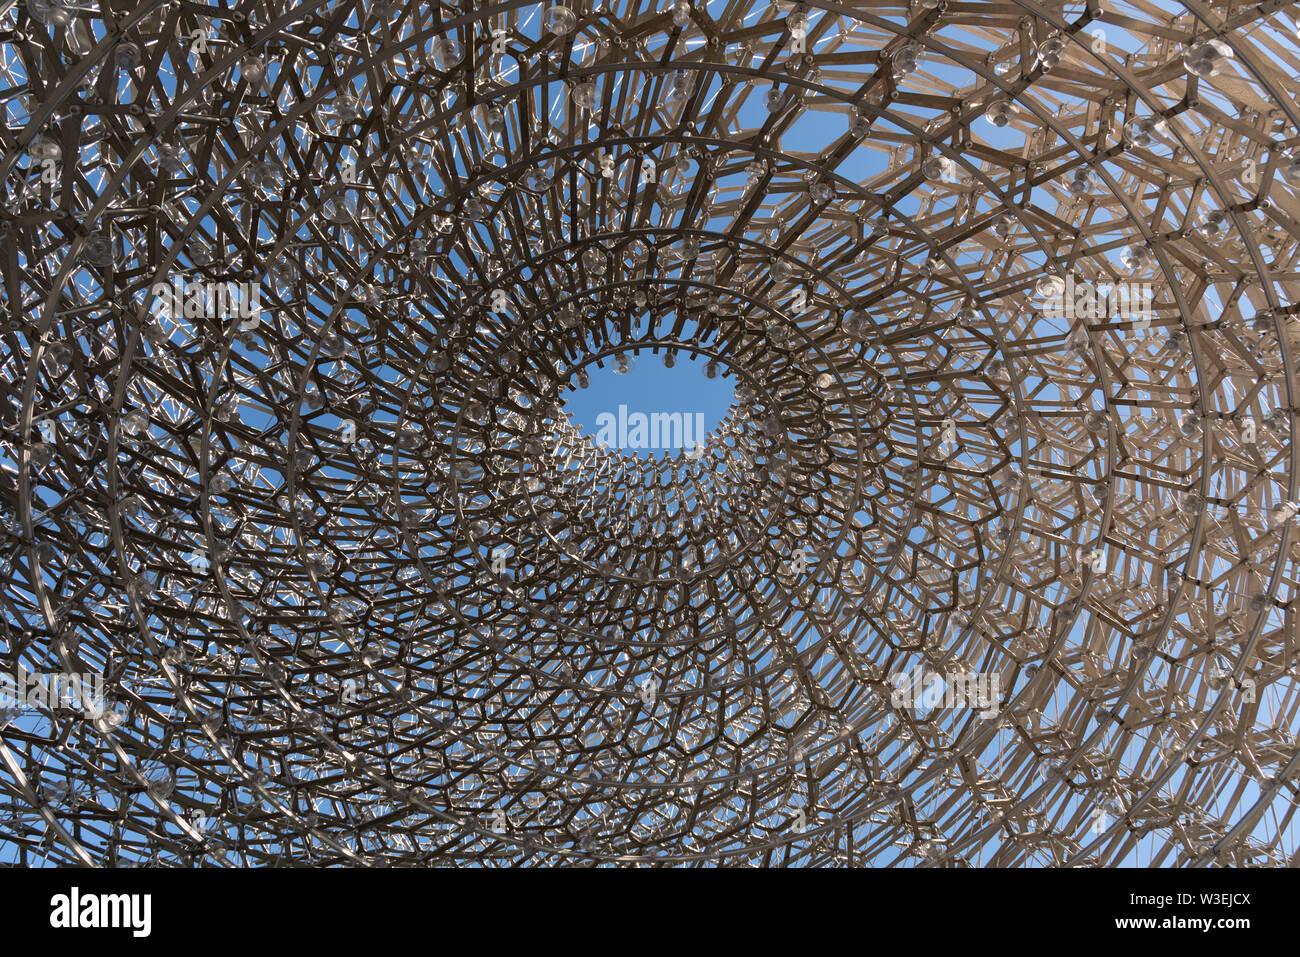 The Hive, Kew Gardens, London, UK - Stock Image